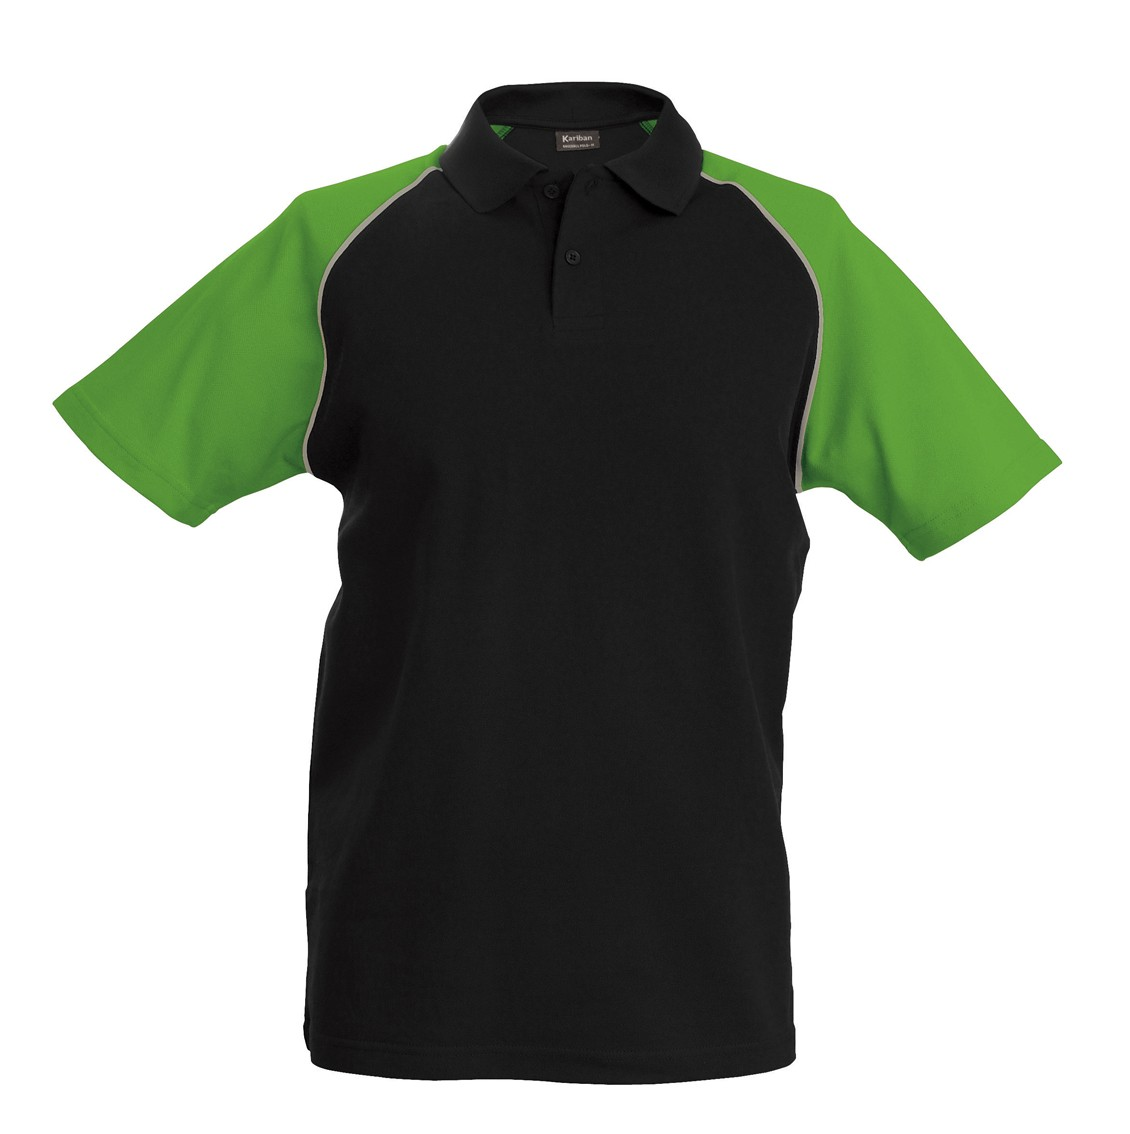 K226 Black - Green